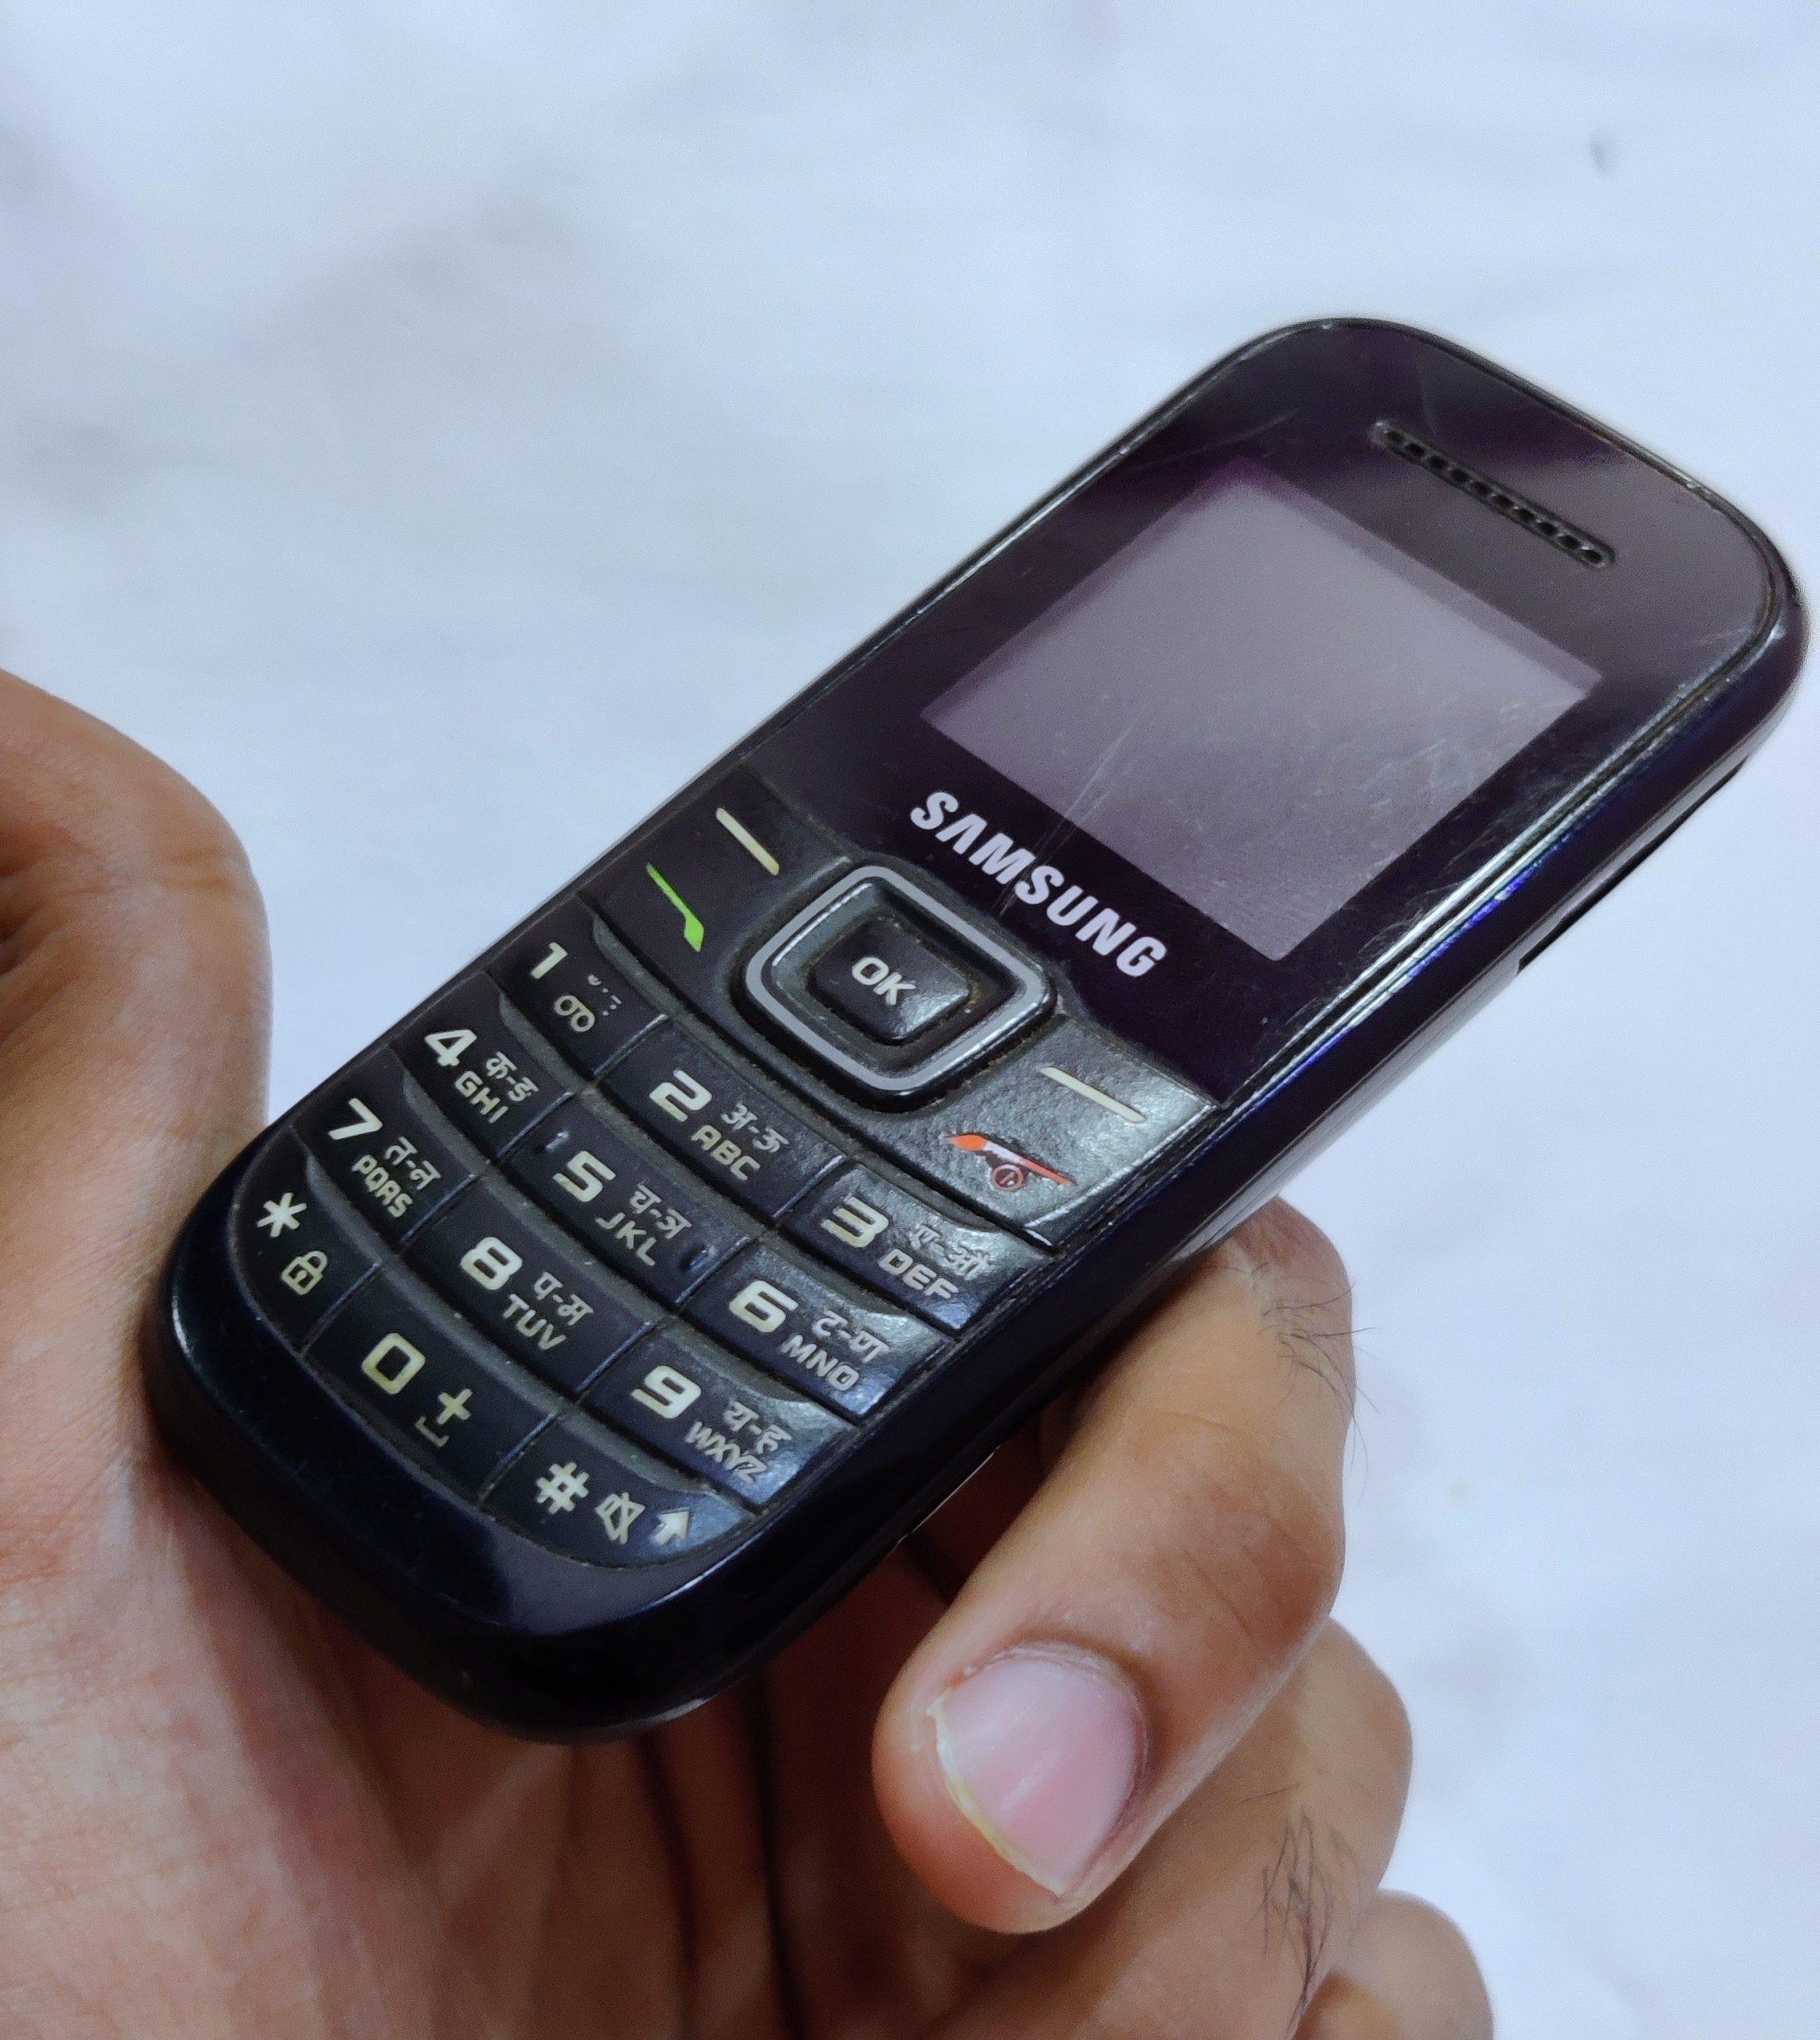 A Samsung keypad phone